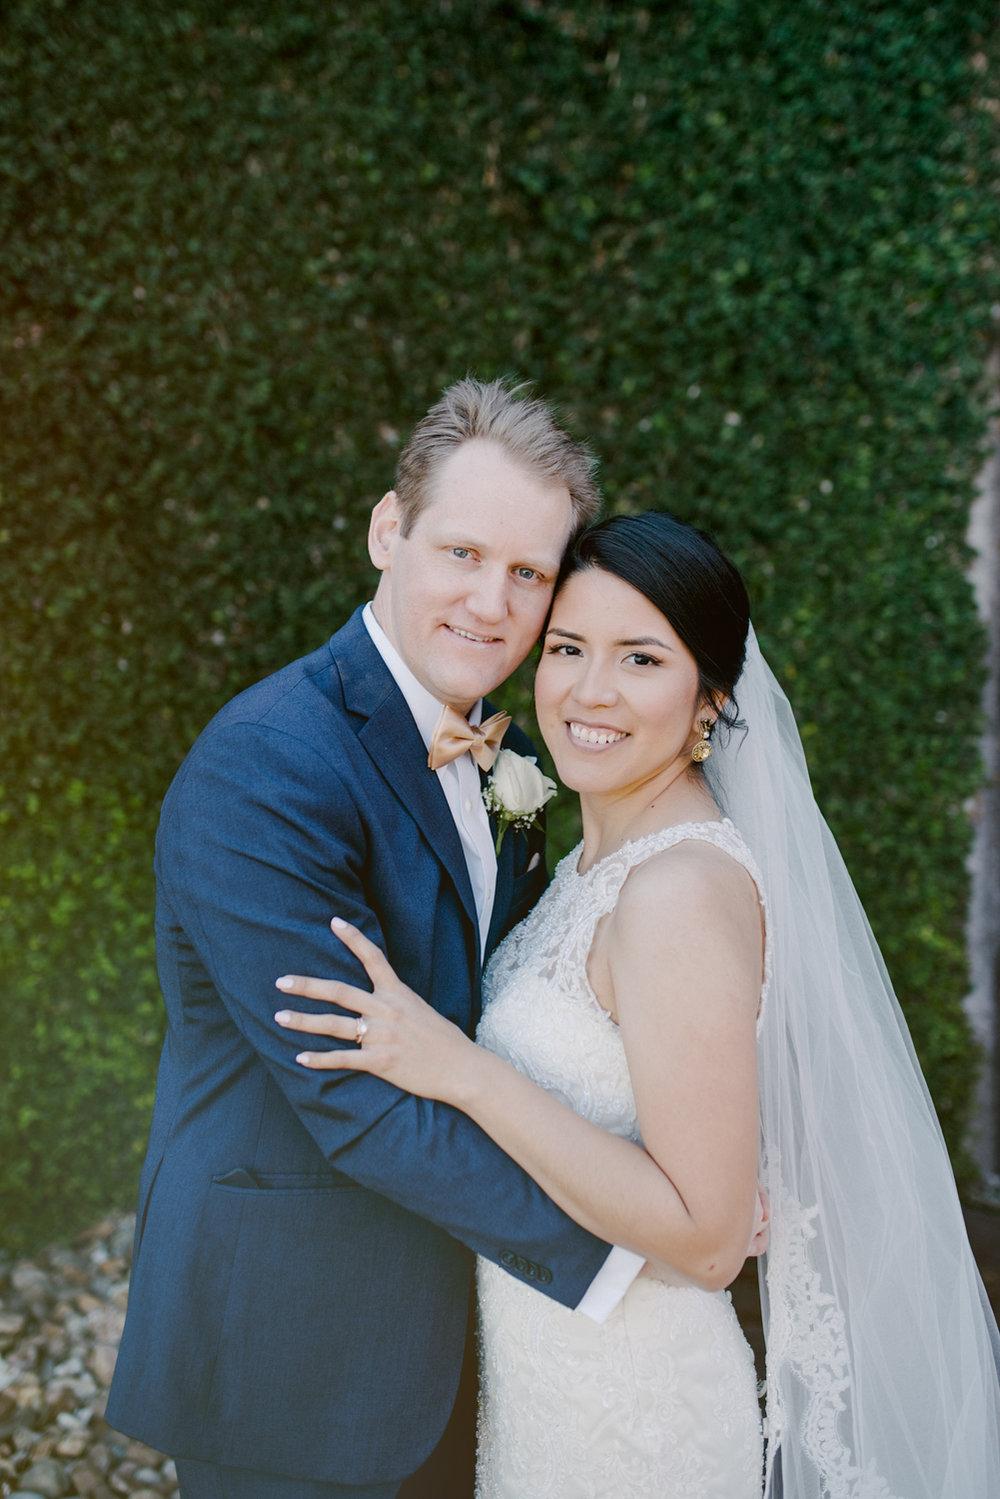 casperwedding-texasweddings-houstonweddings-oldedobbestation-montgomerytx-montgomeryweddings-bride-groom-bridalparty-weddingdress-70.jpg